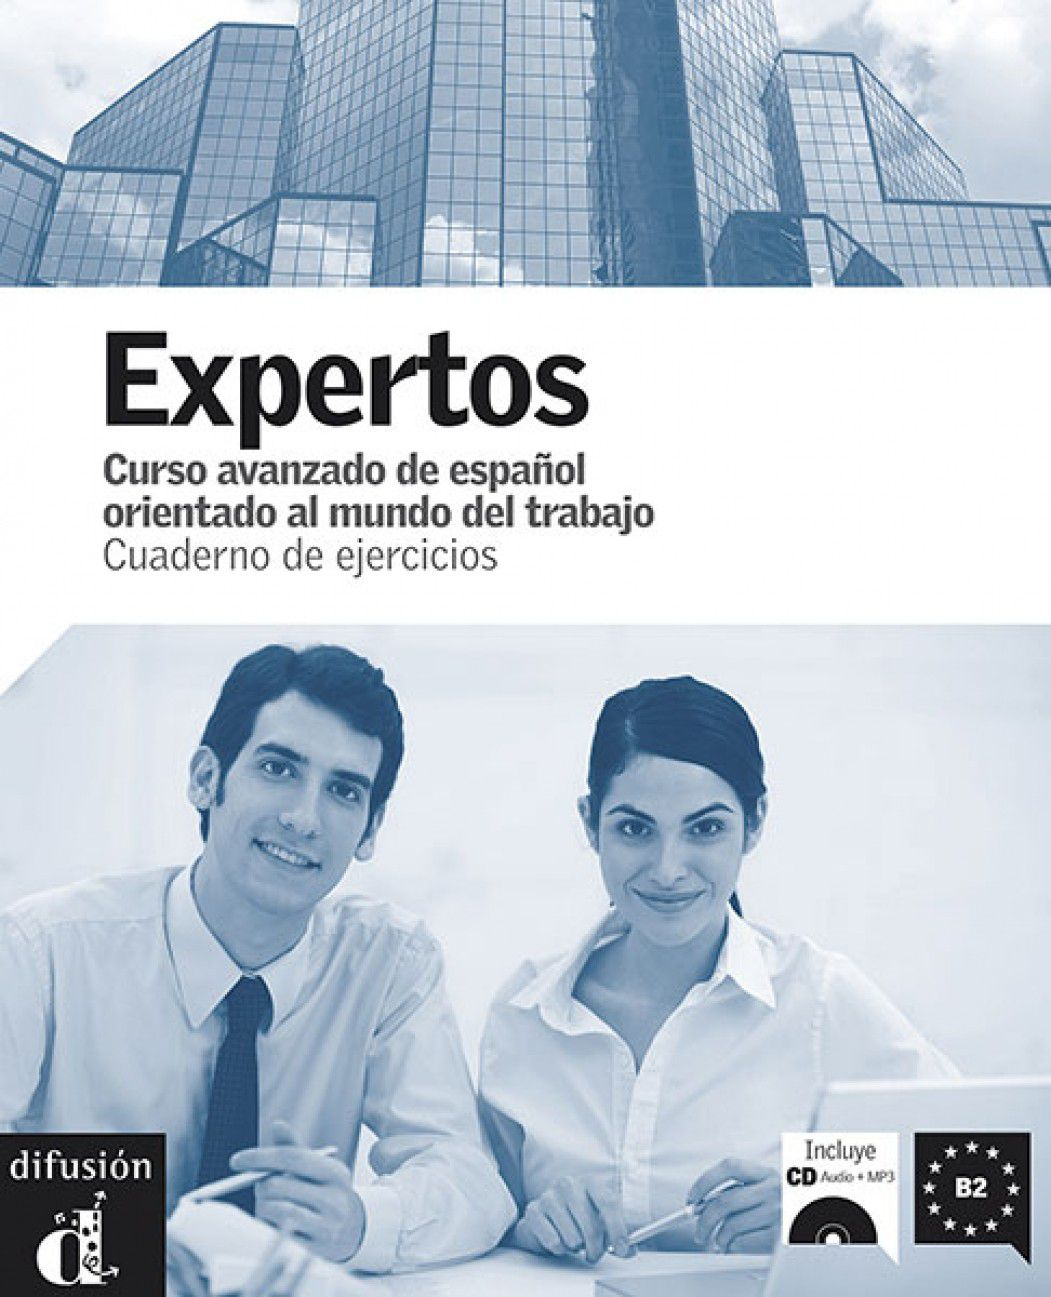 EXPERTOS - CURSO AVANZADO DE ESPANOL ORIENTADO A01